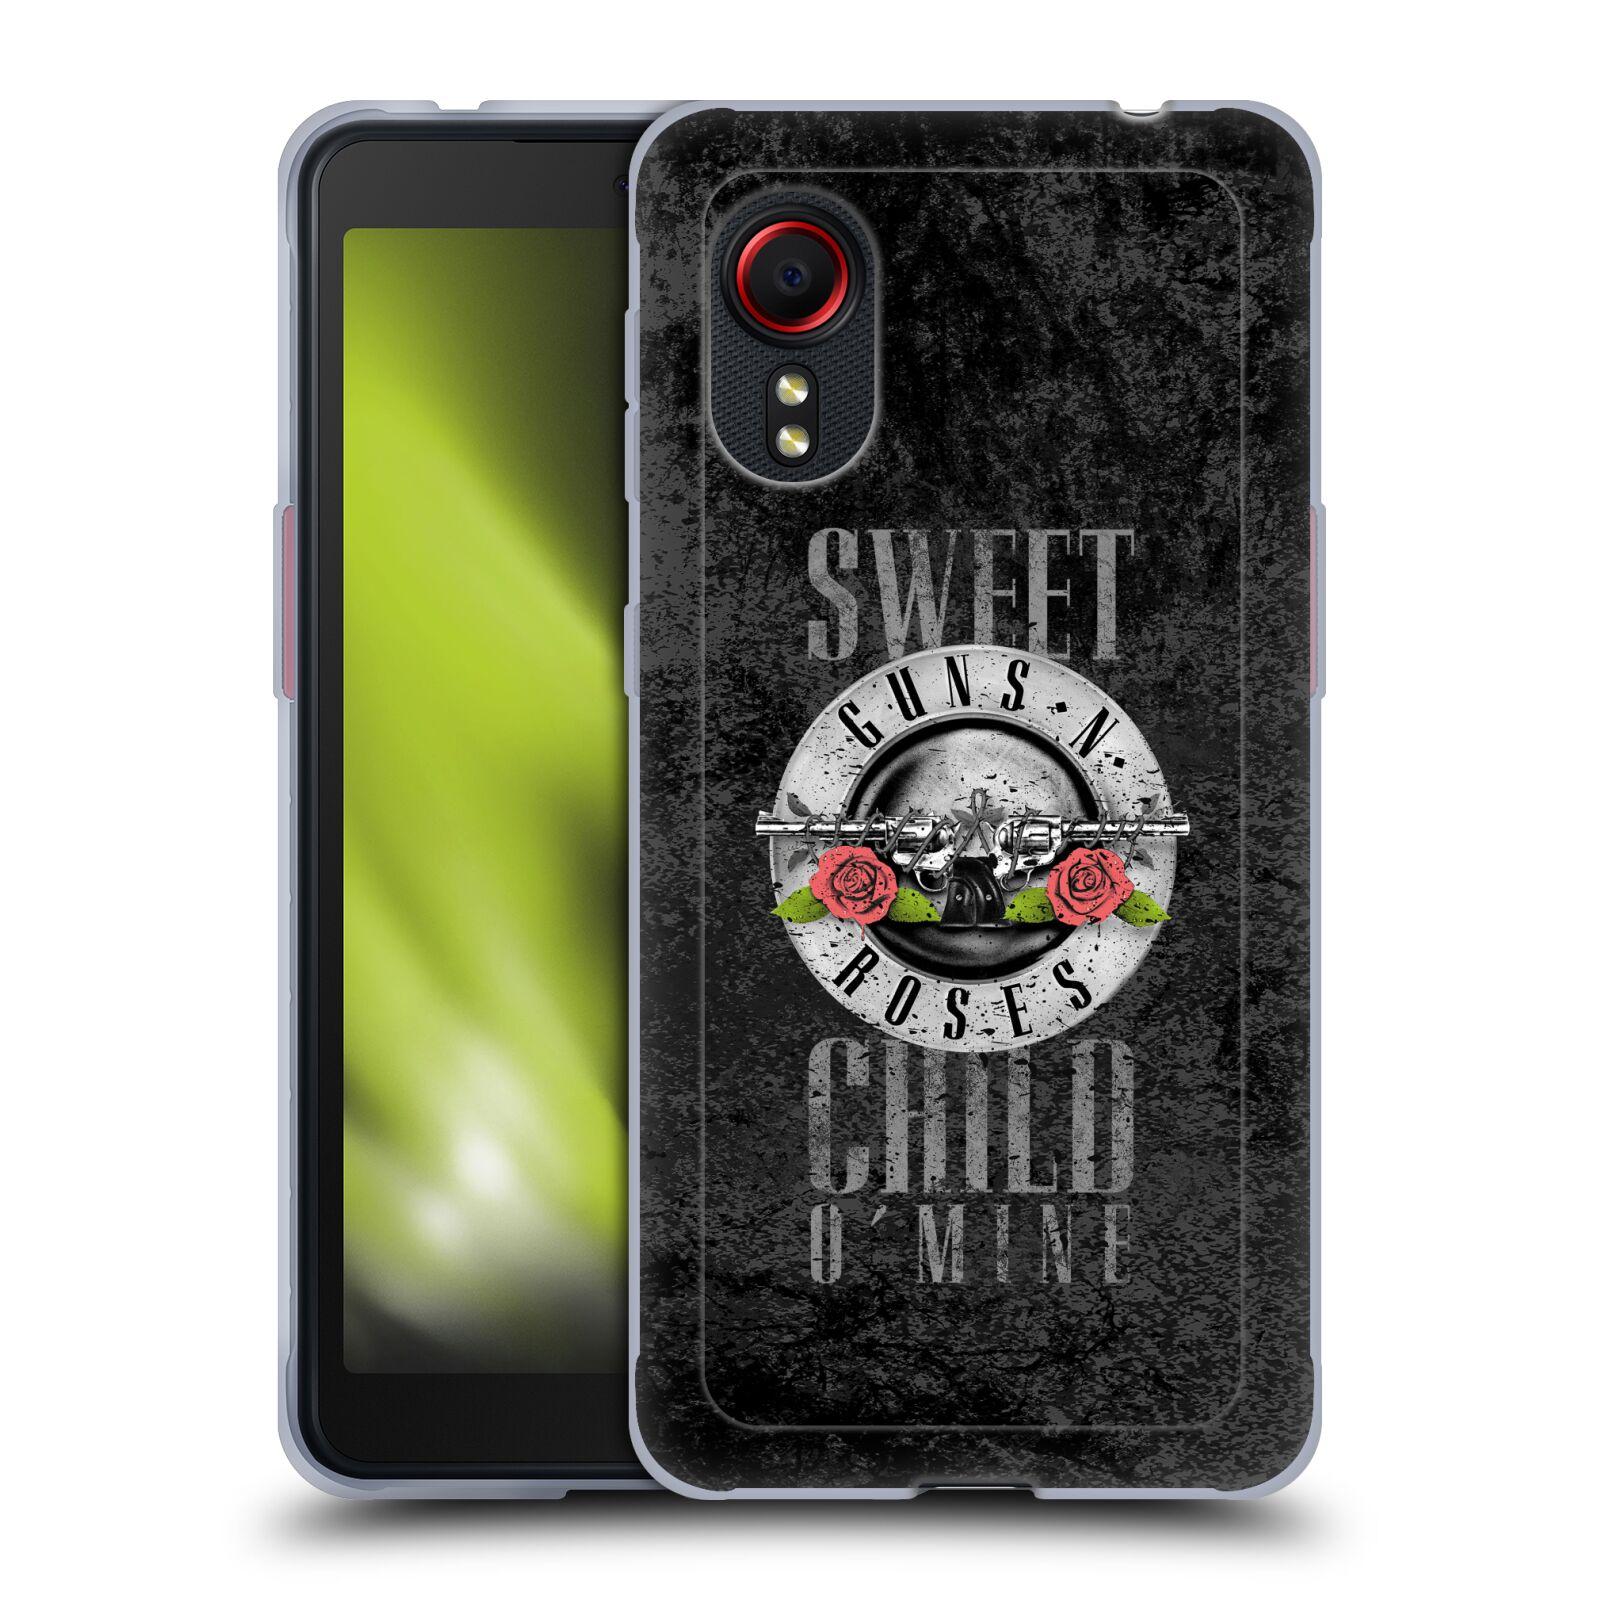 Silikonové pouzdro na mobil Samsung Galaxy Xcover 5 - Head Case - Guns N' Roses - Sweet Child